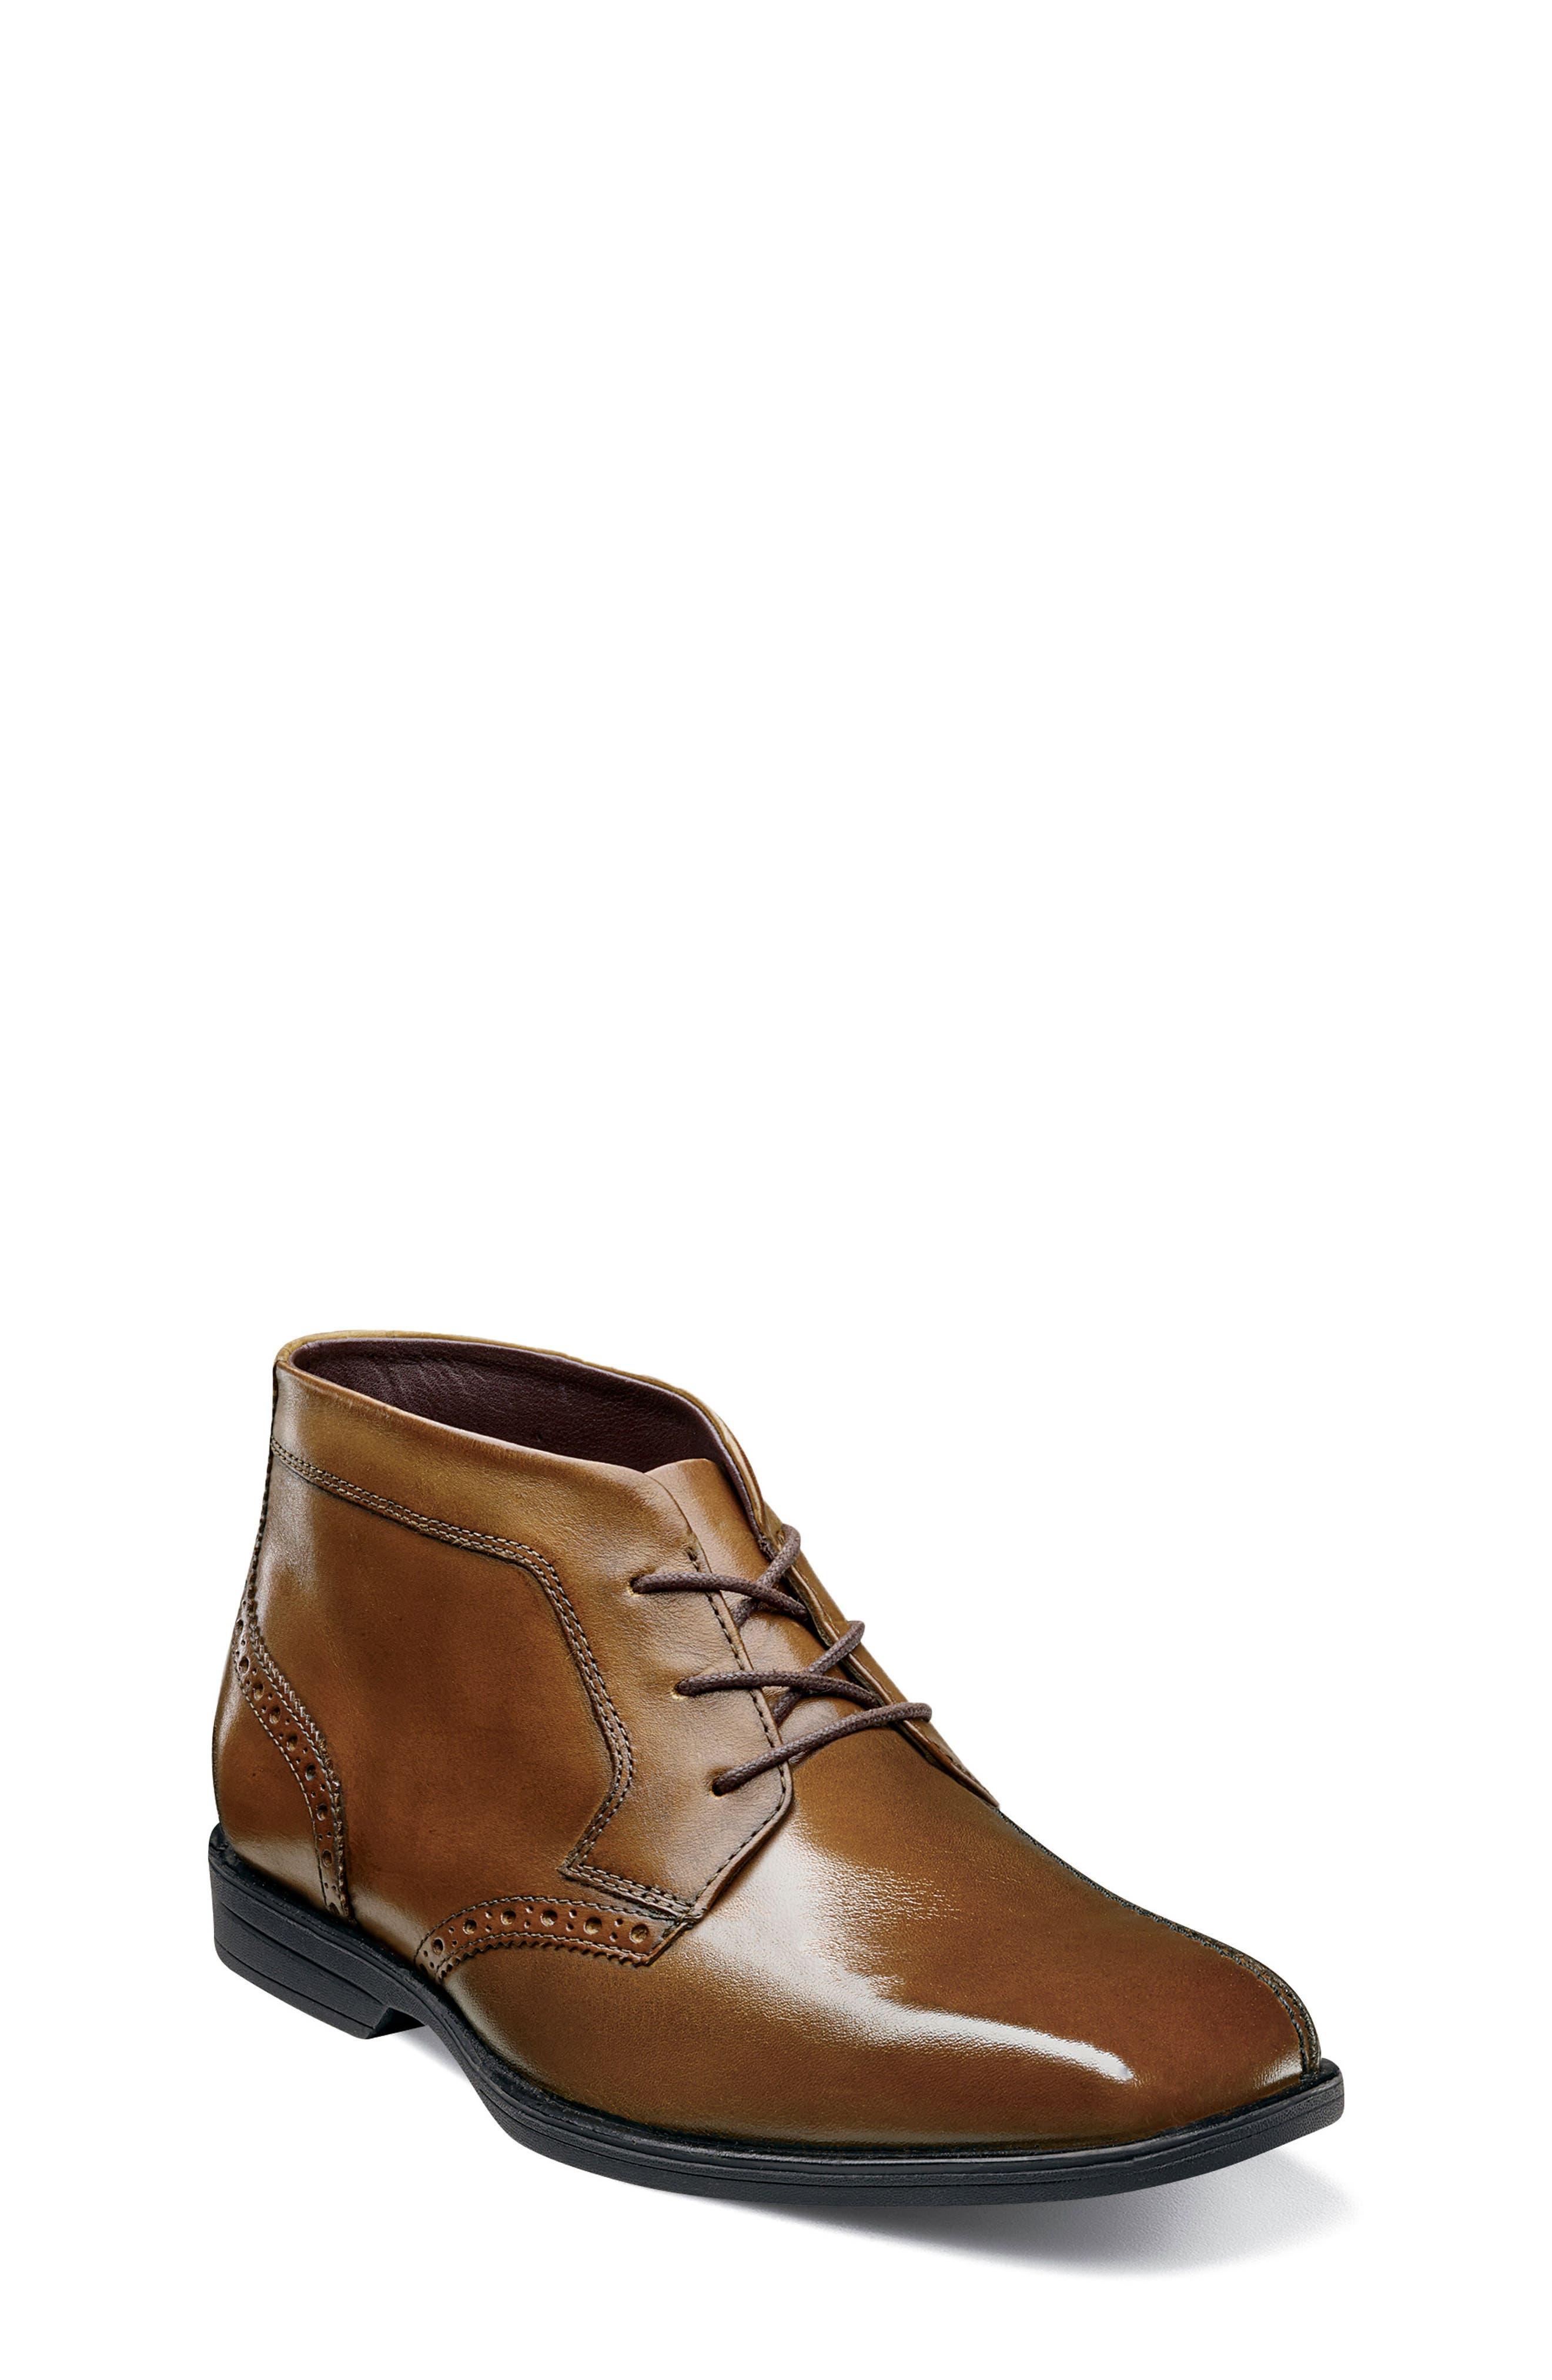 Boys Florsheim Reveal Chukka Boot Size 4 M  Brown